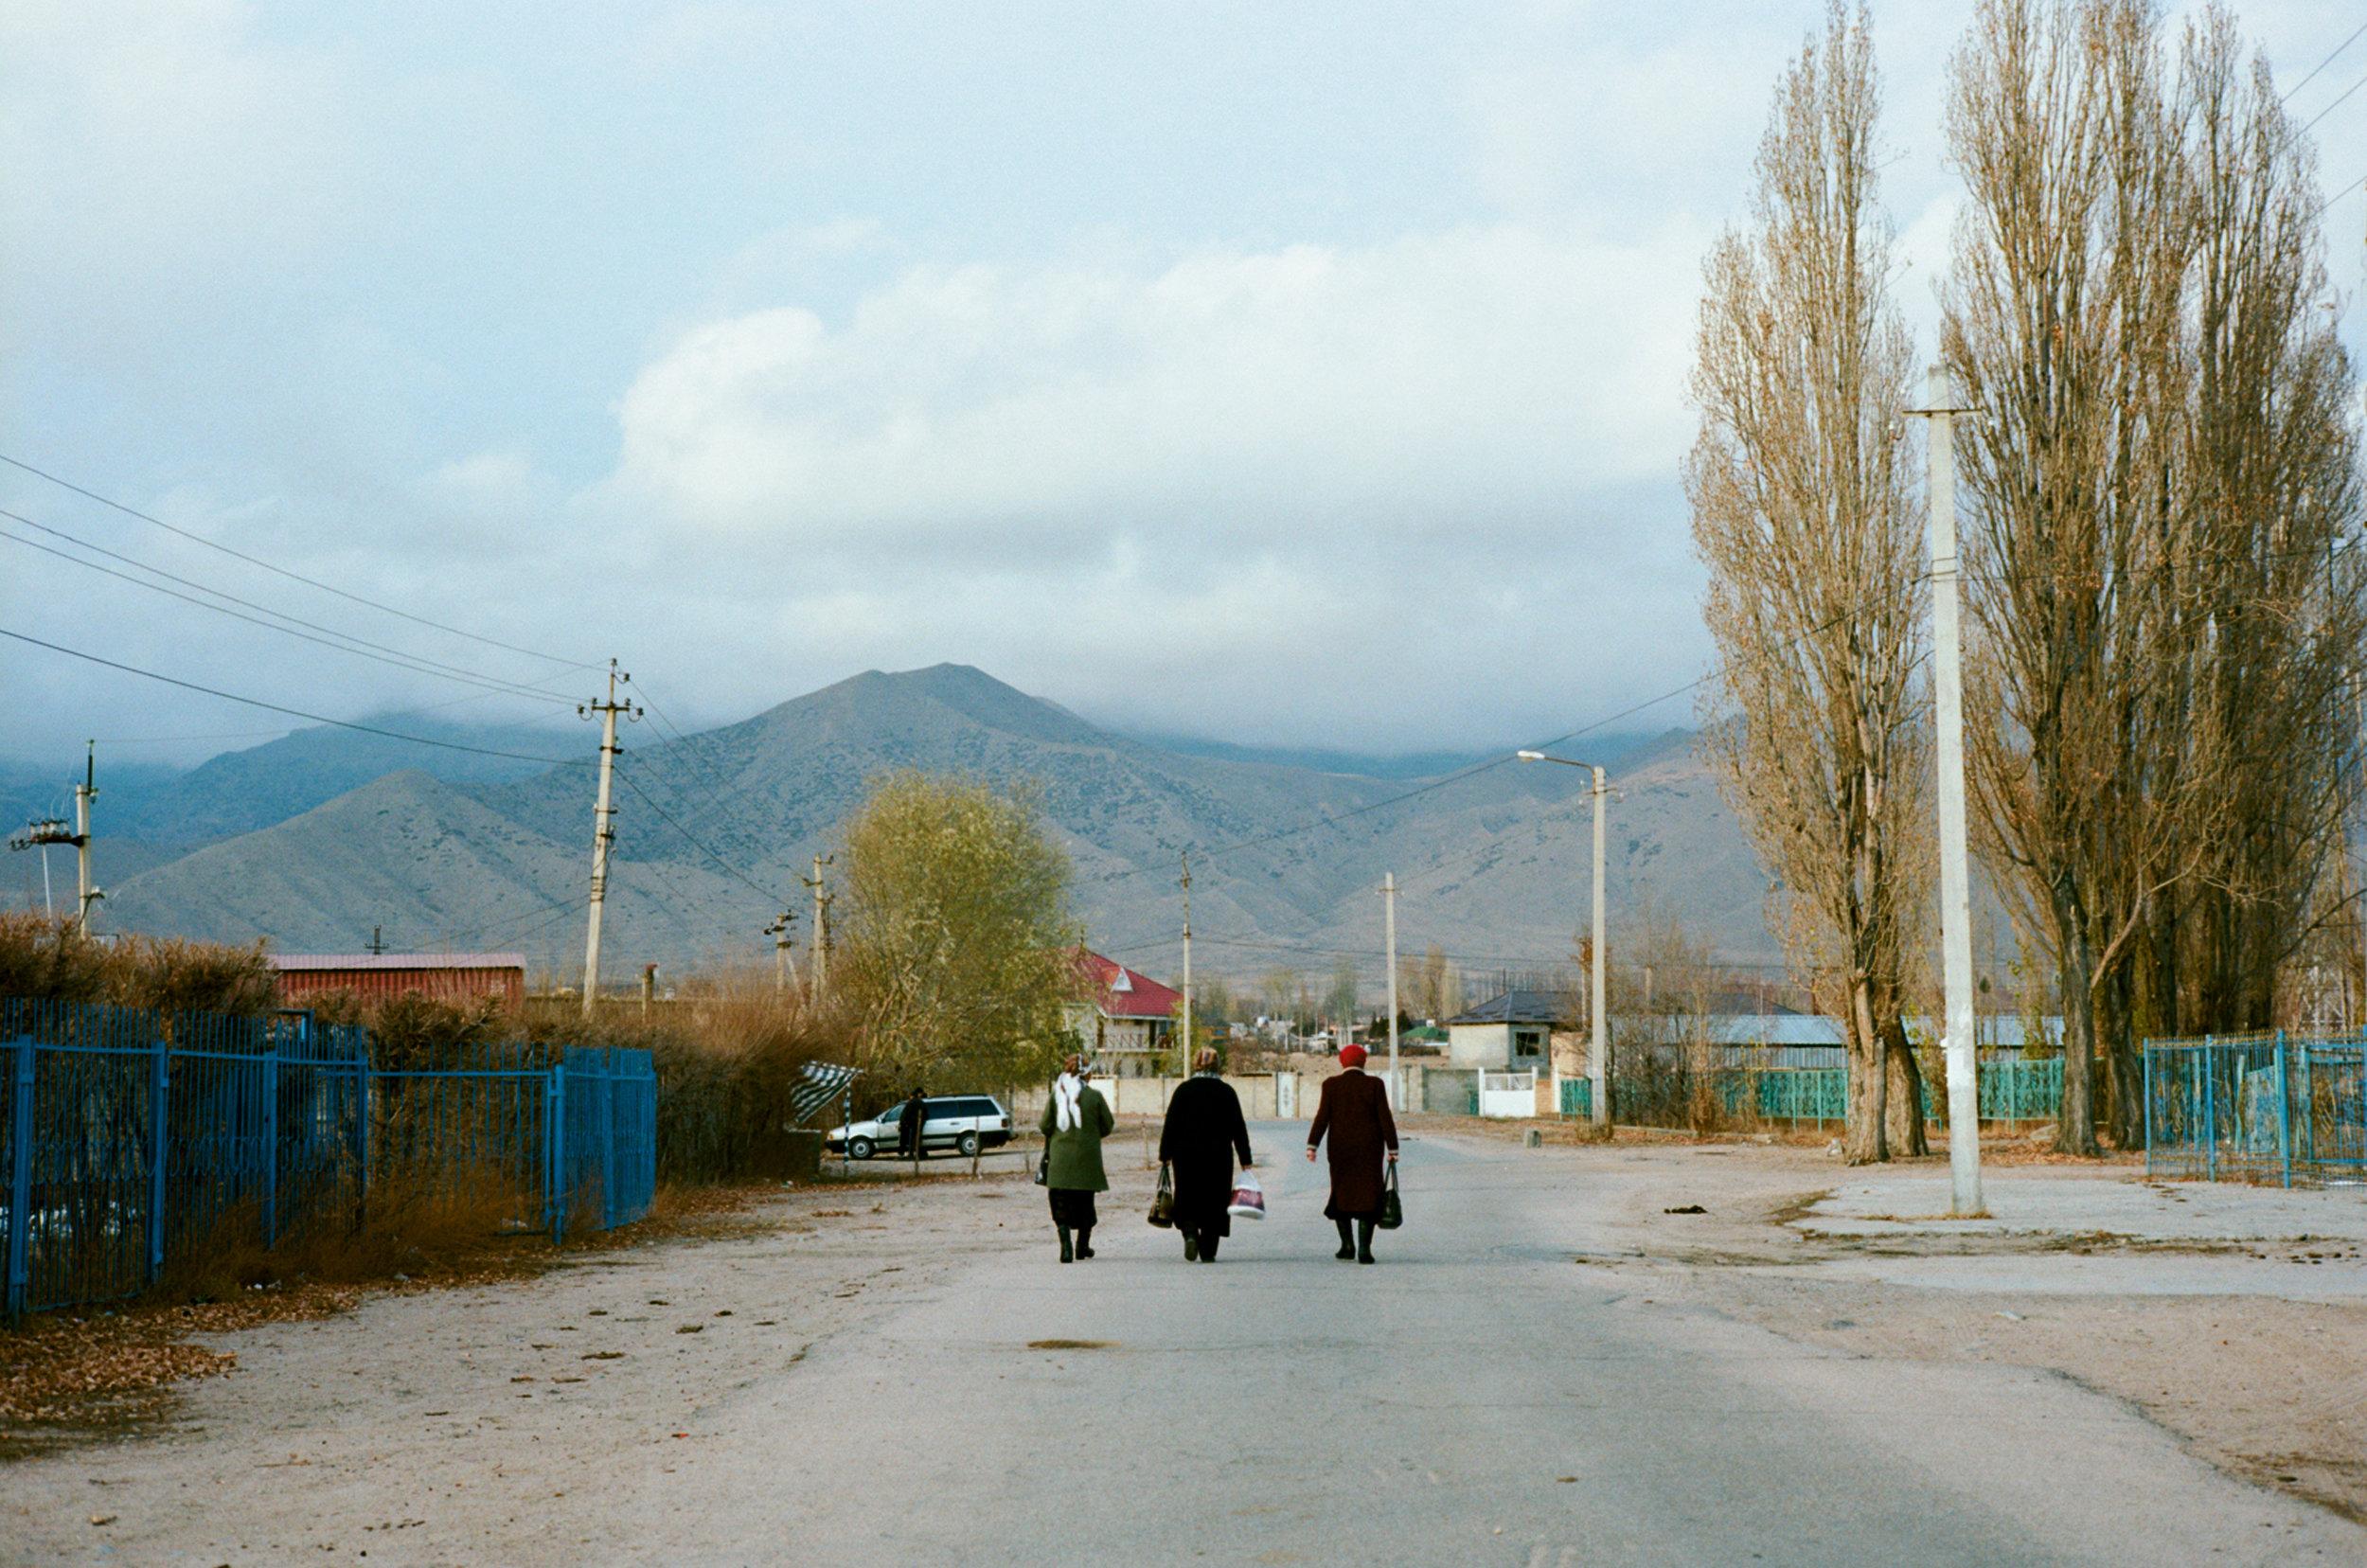 Three women walking around the shores of lake Issyk-Köl at Cholpon-Ata, Kyrgyzstan. December 2017 © Juan Aguirre Fernández-Bravo